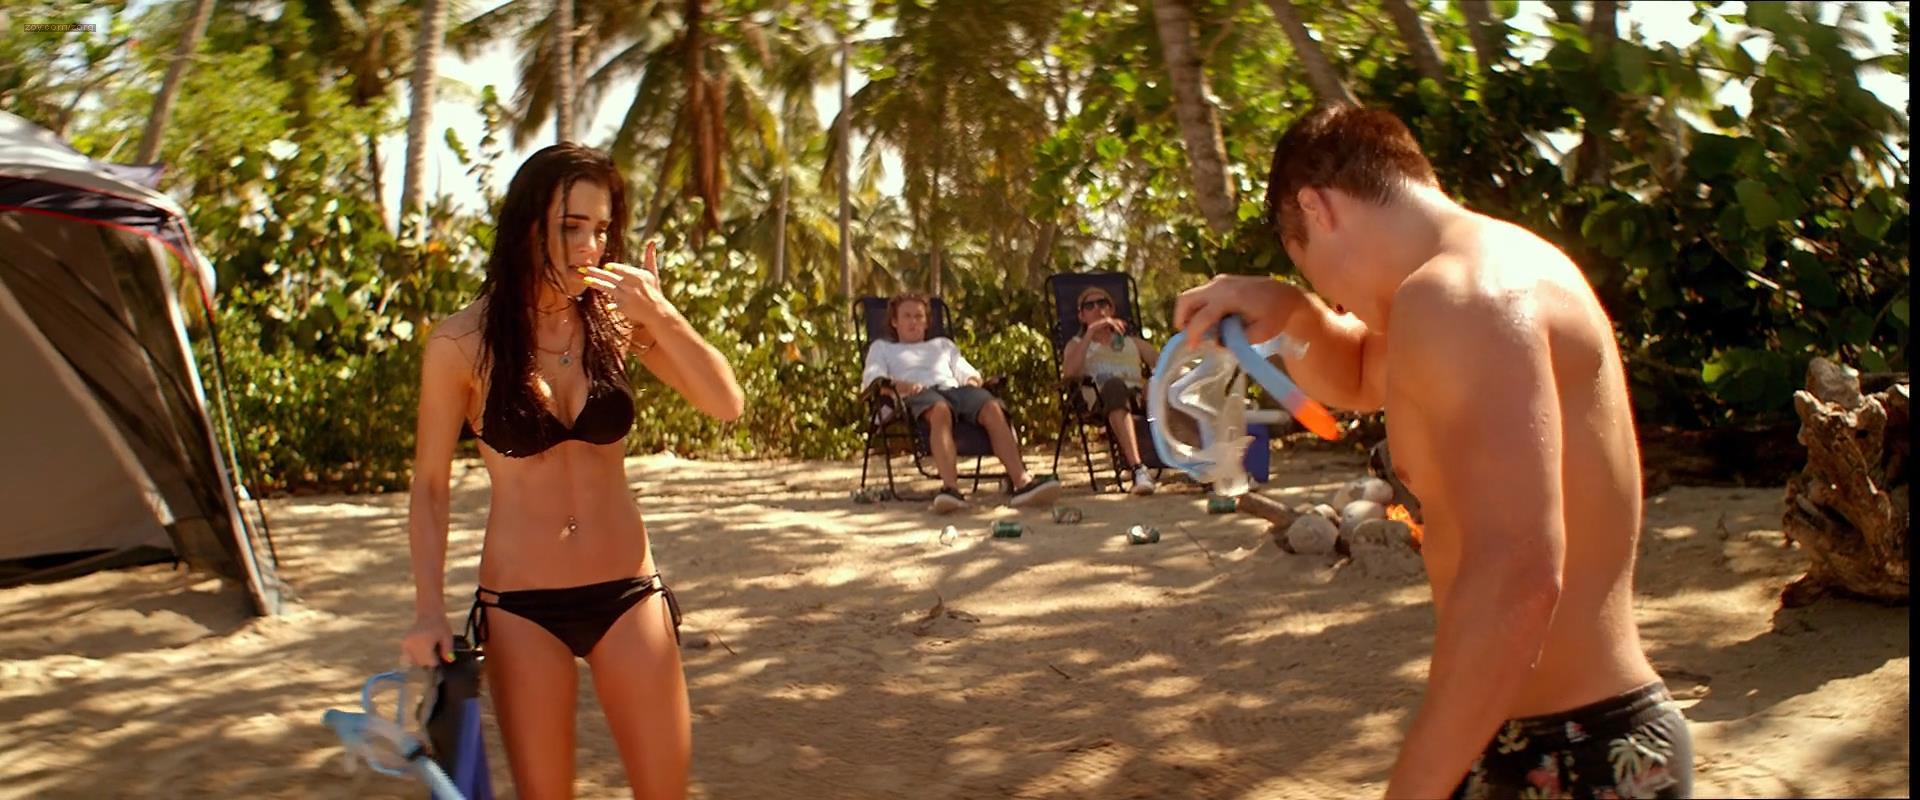 Jillian Murray nude brief topless but very hot in bikini- Cabin Fever Patient Zero (2014) hd1080p